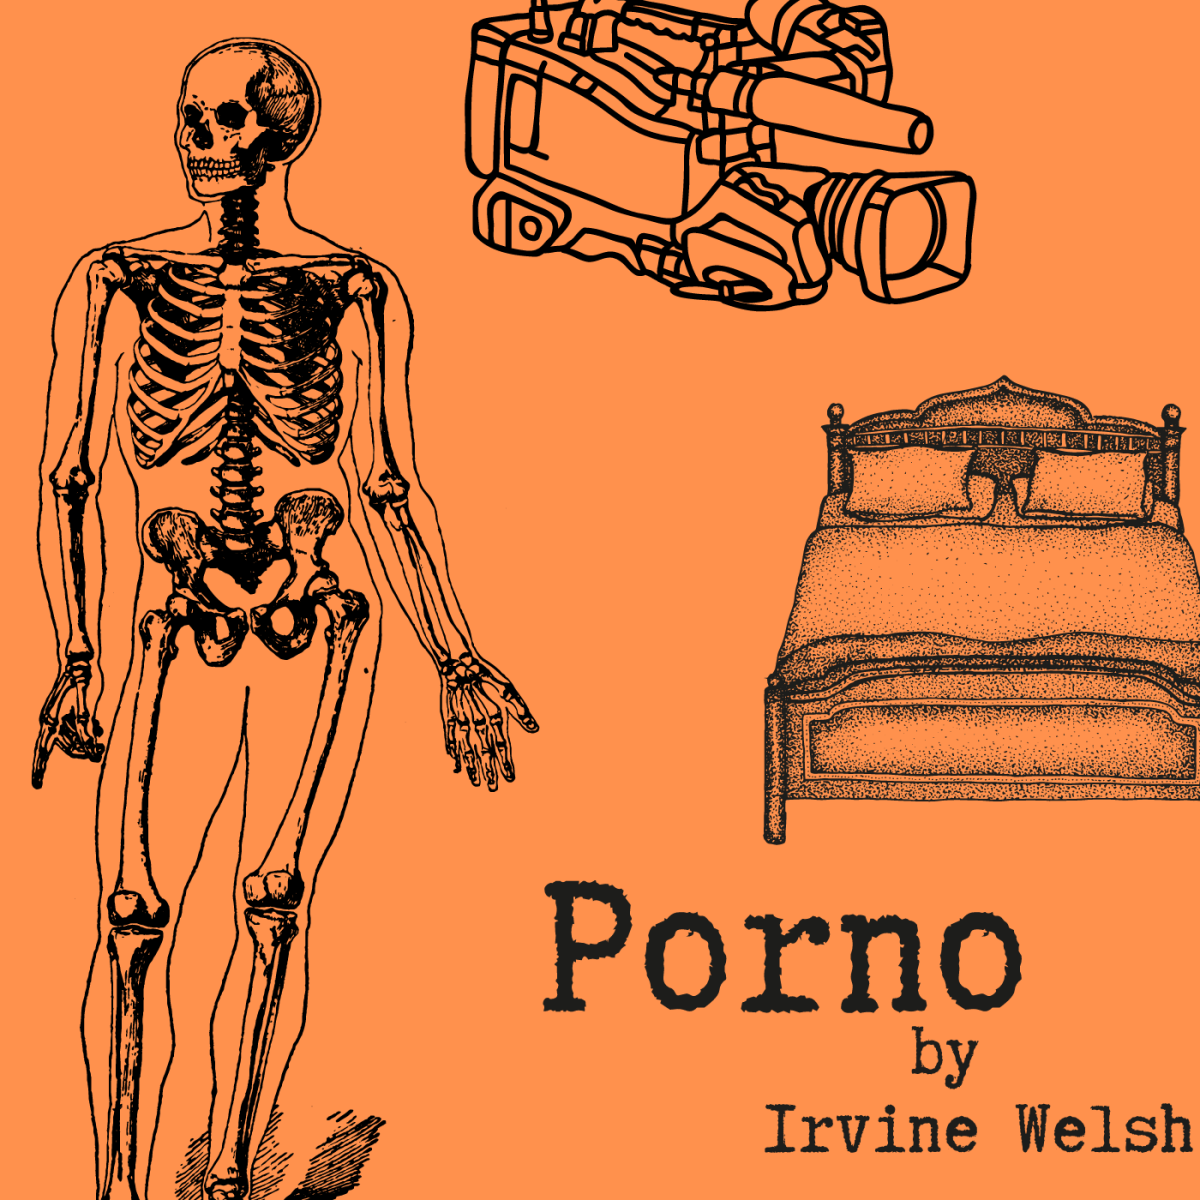 """Porno"" by Irvine Welsh"